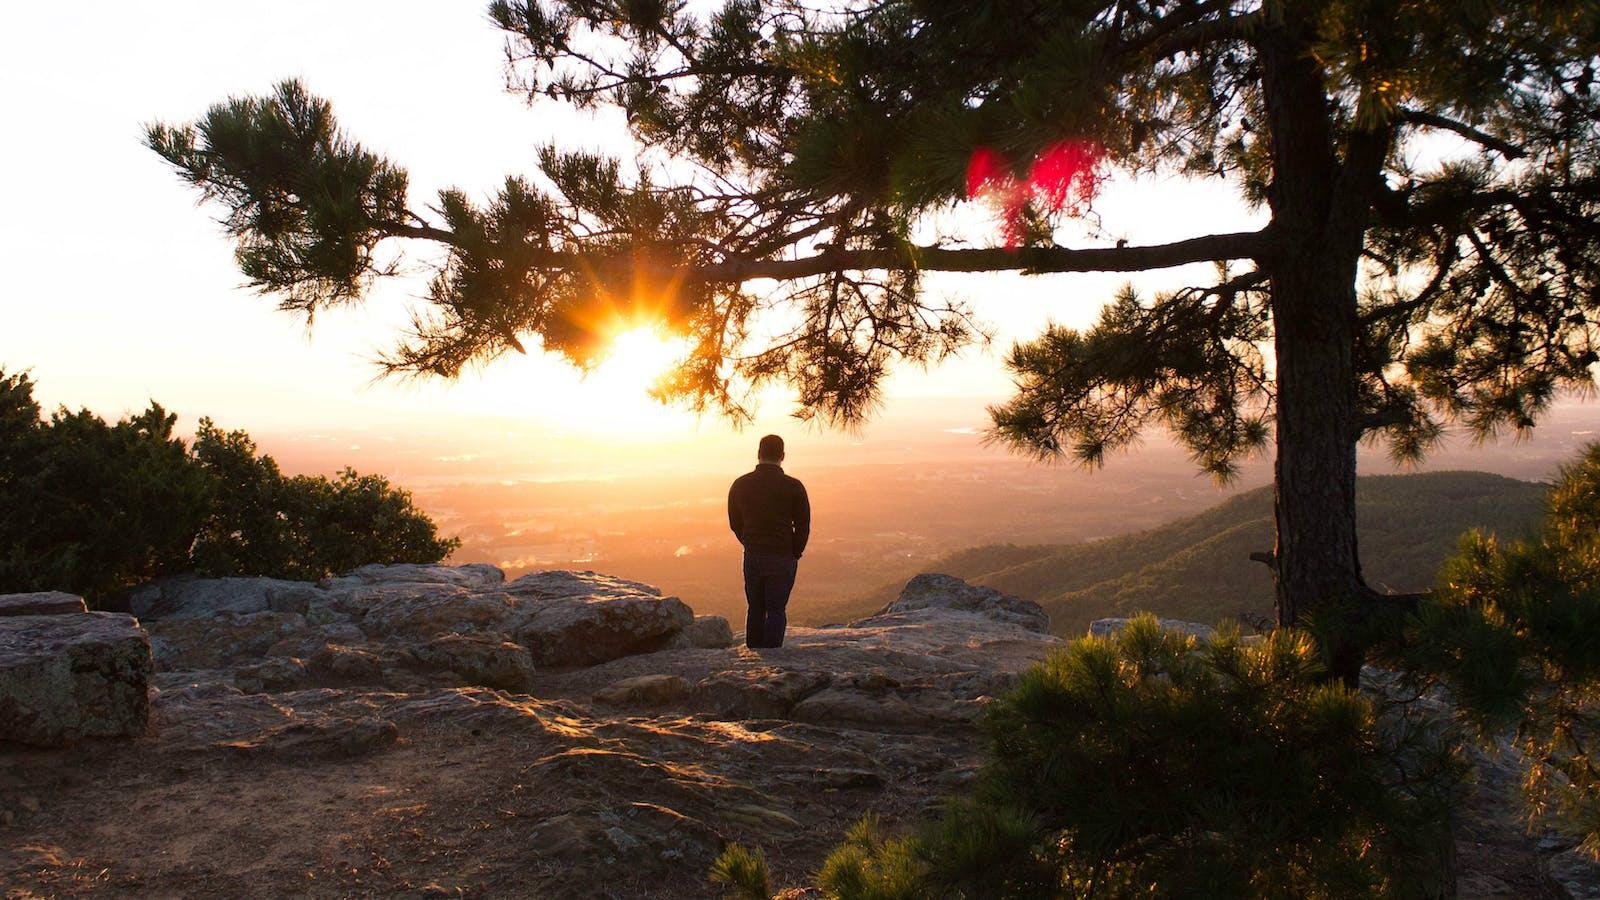 Our Hope: The Glory of God | Desiring God